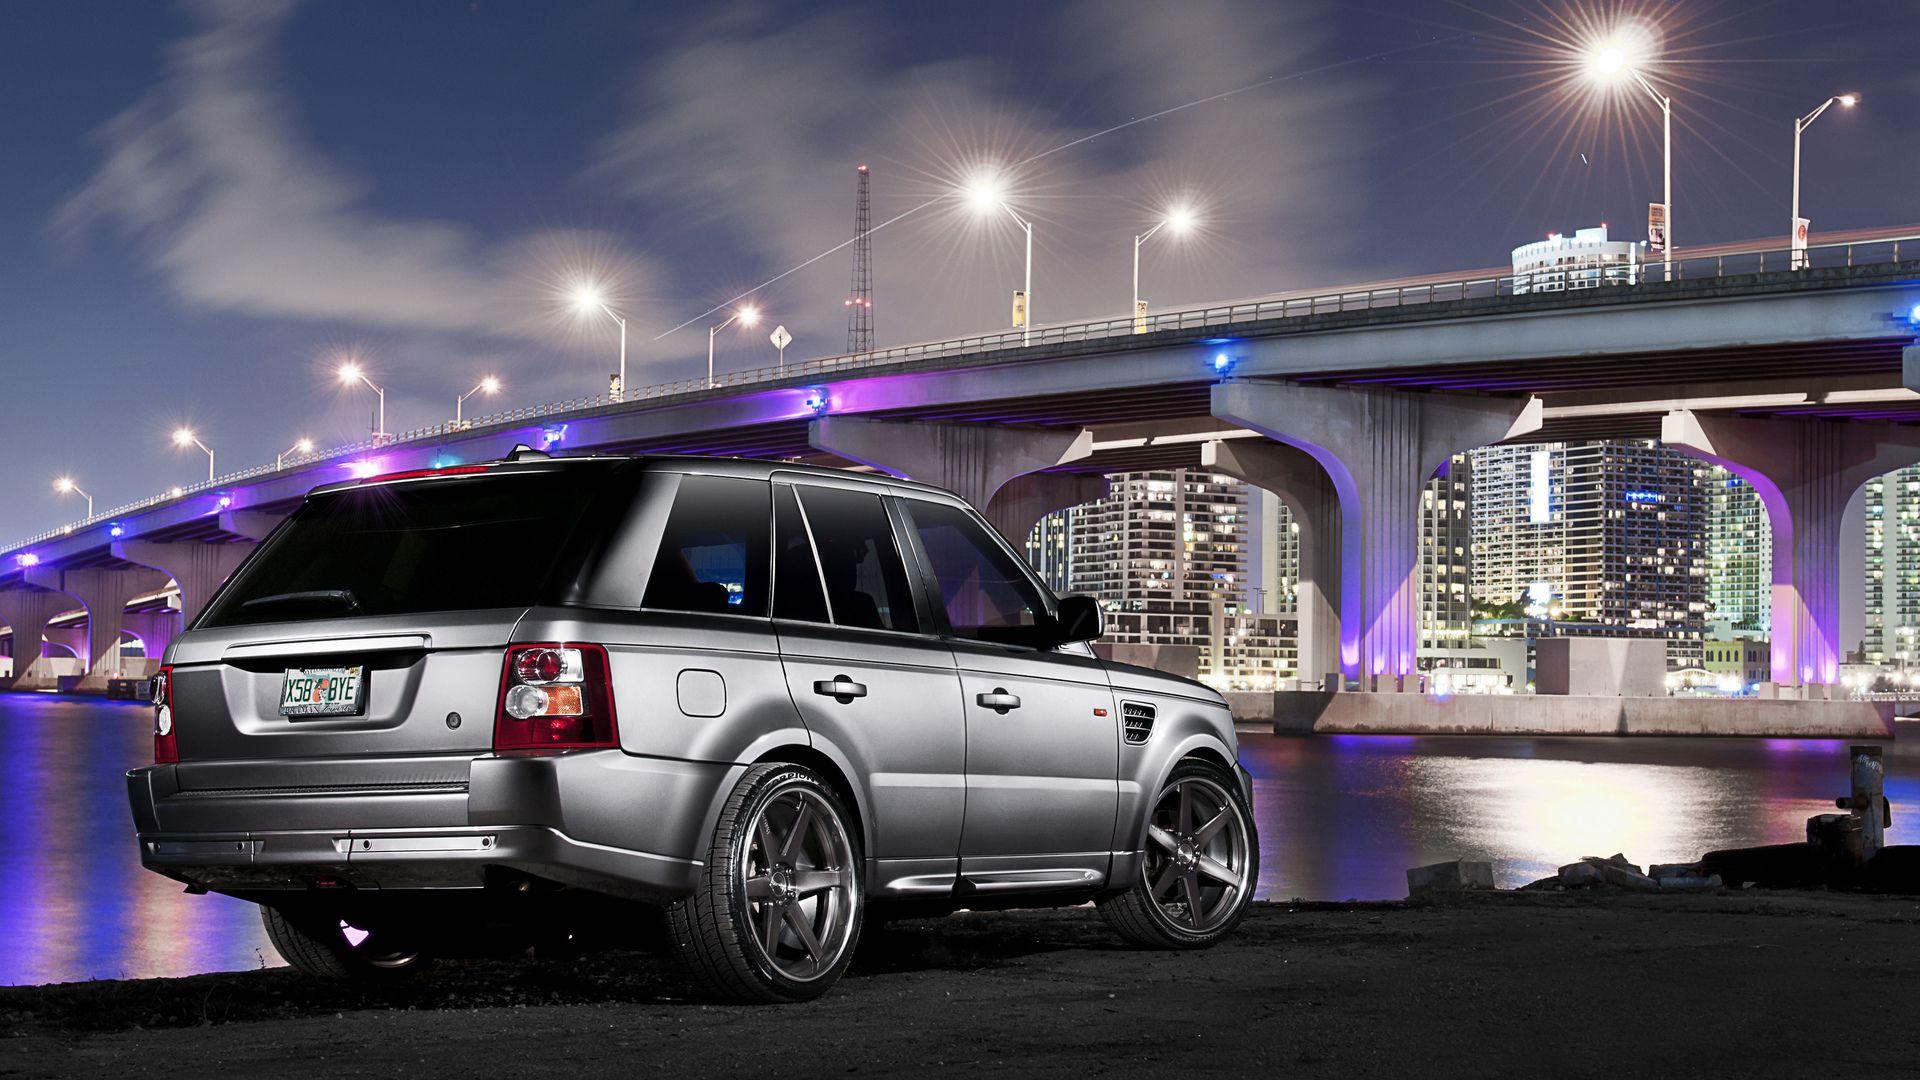 Range Rover free image